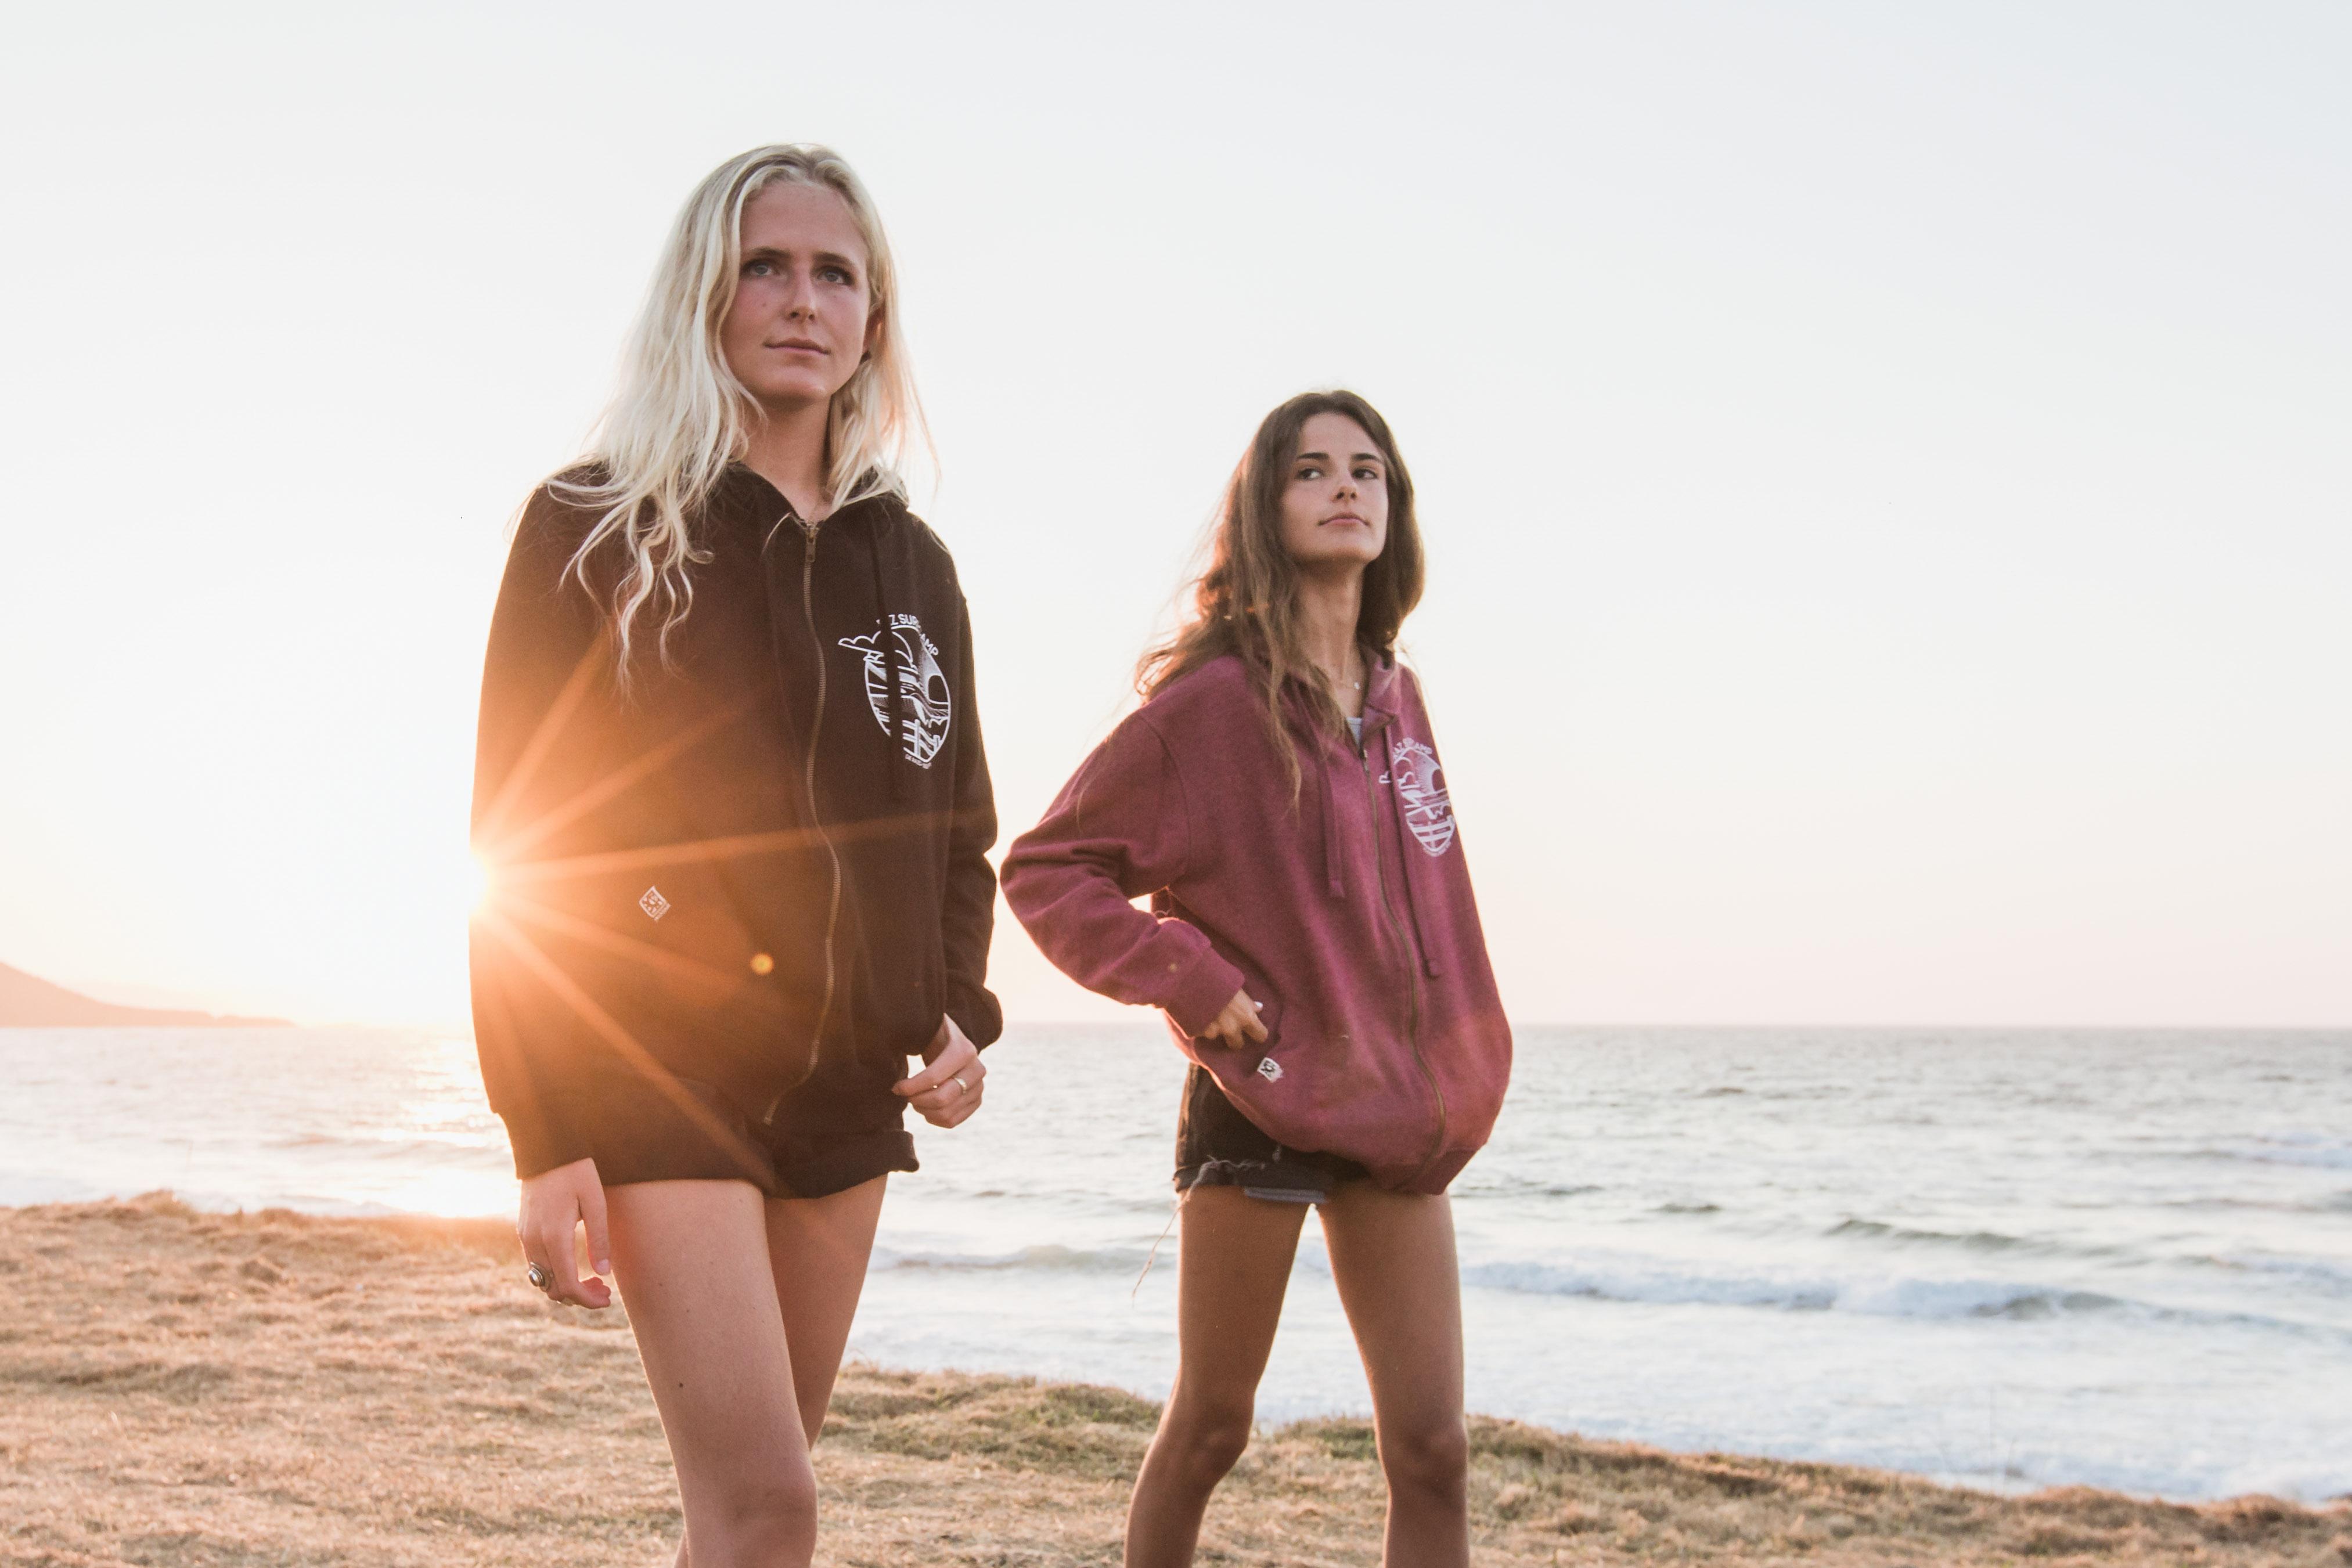 moda surfera raz surfcamp streetwear surfing clothing praia de razo